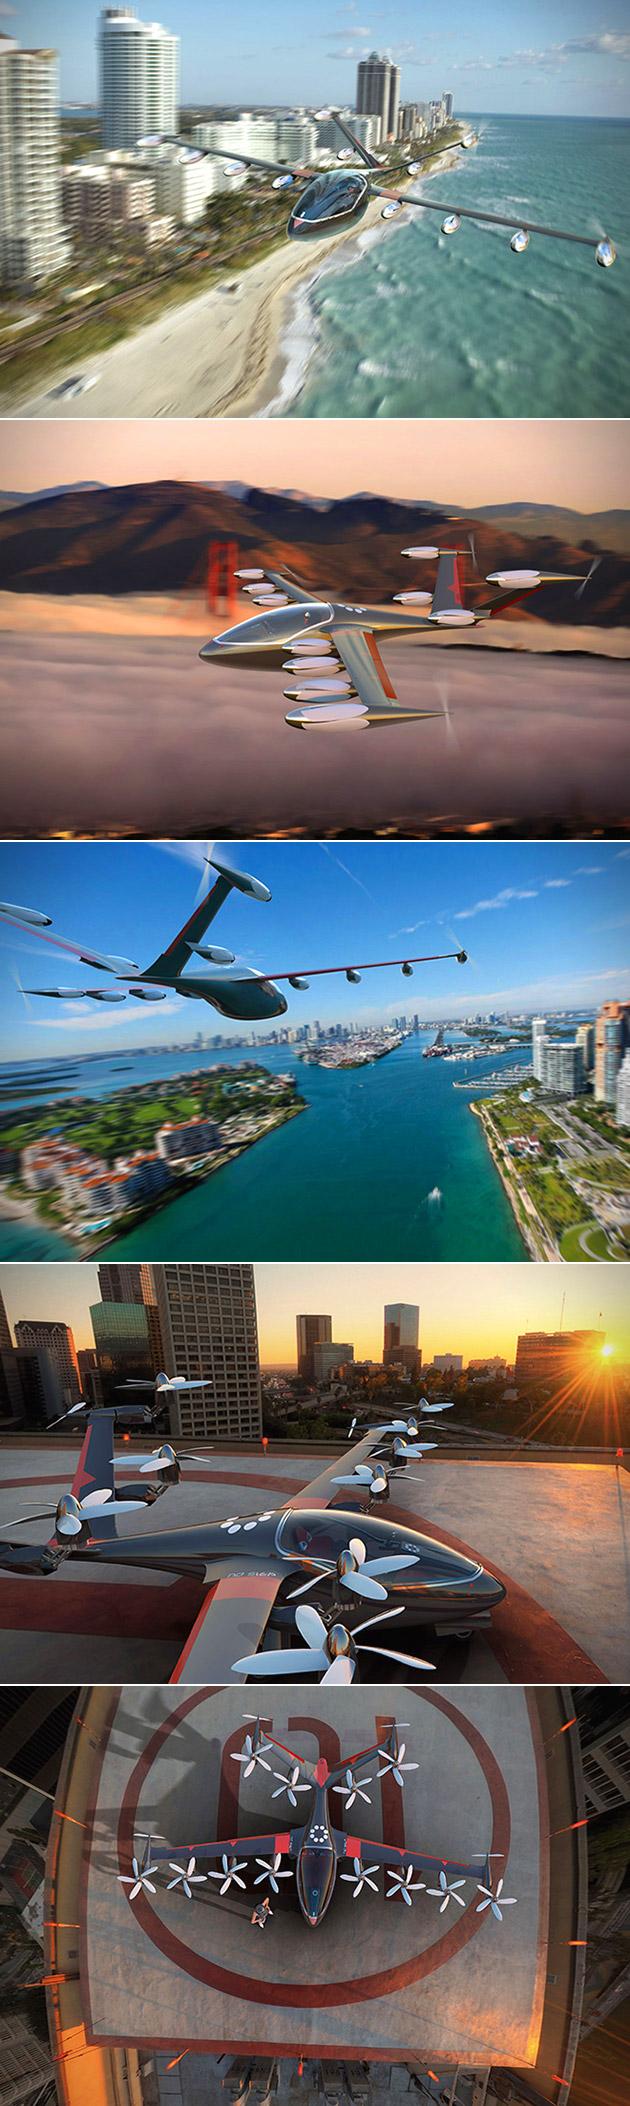 joby-aviation-s2-personal-aircraft-vtol